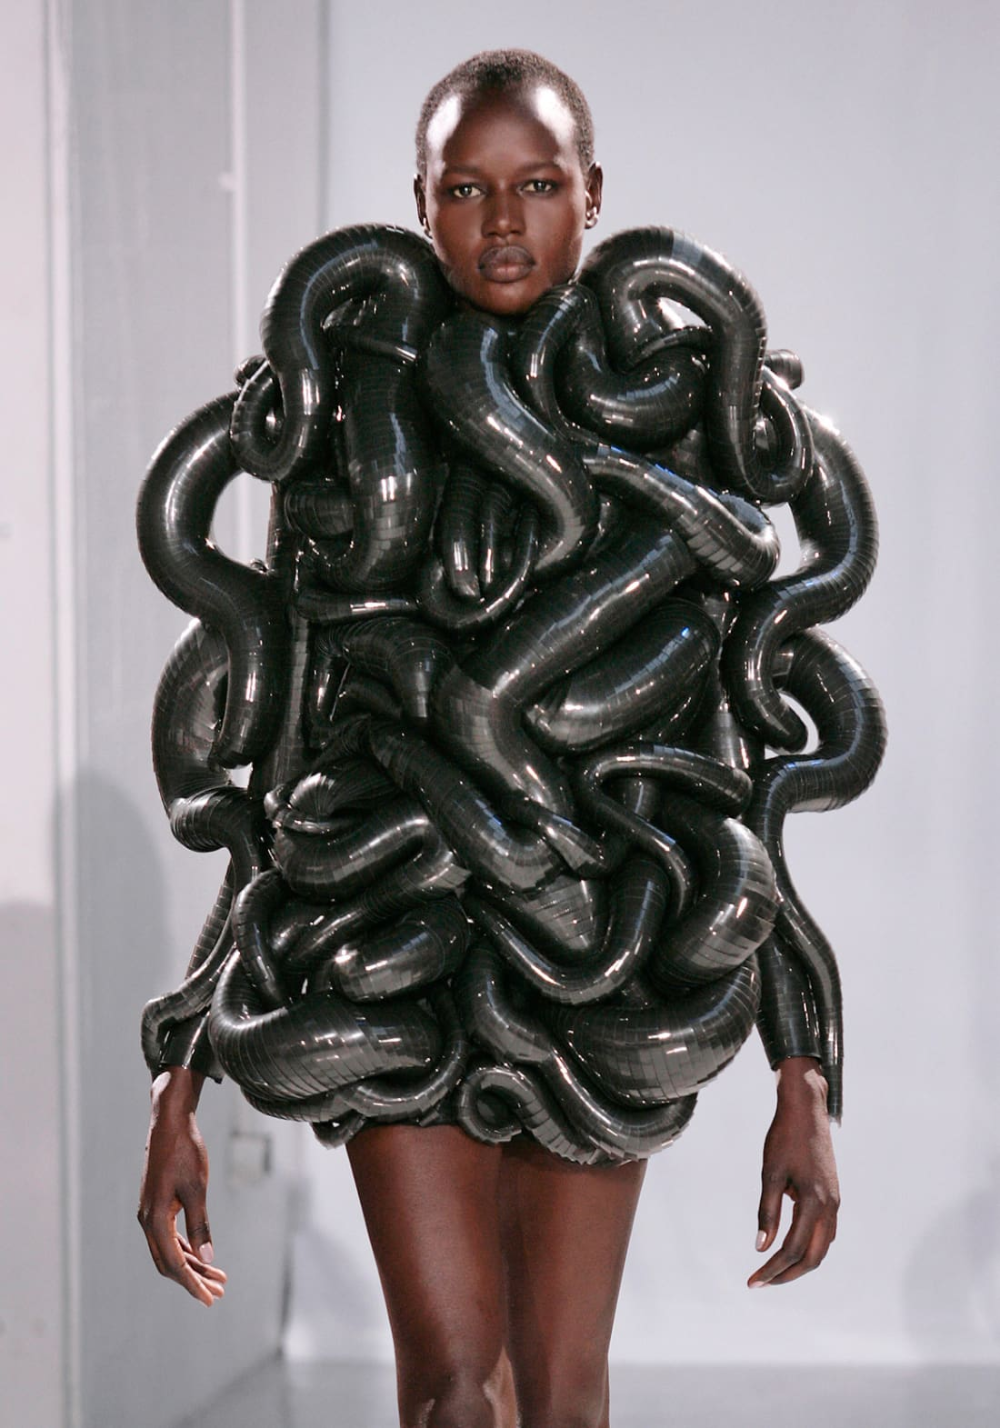 Photo of Iris van Herpen: When high fashion meets science